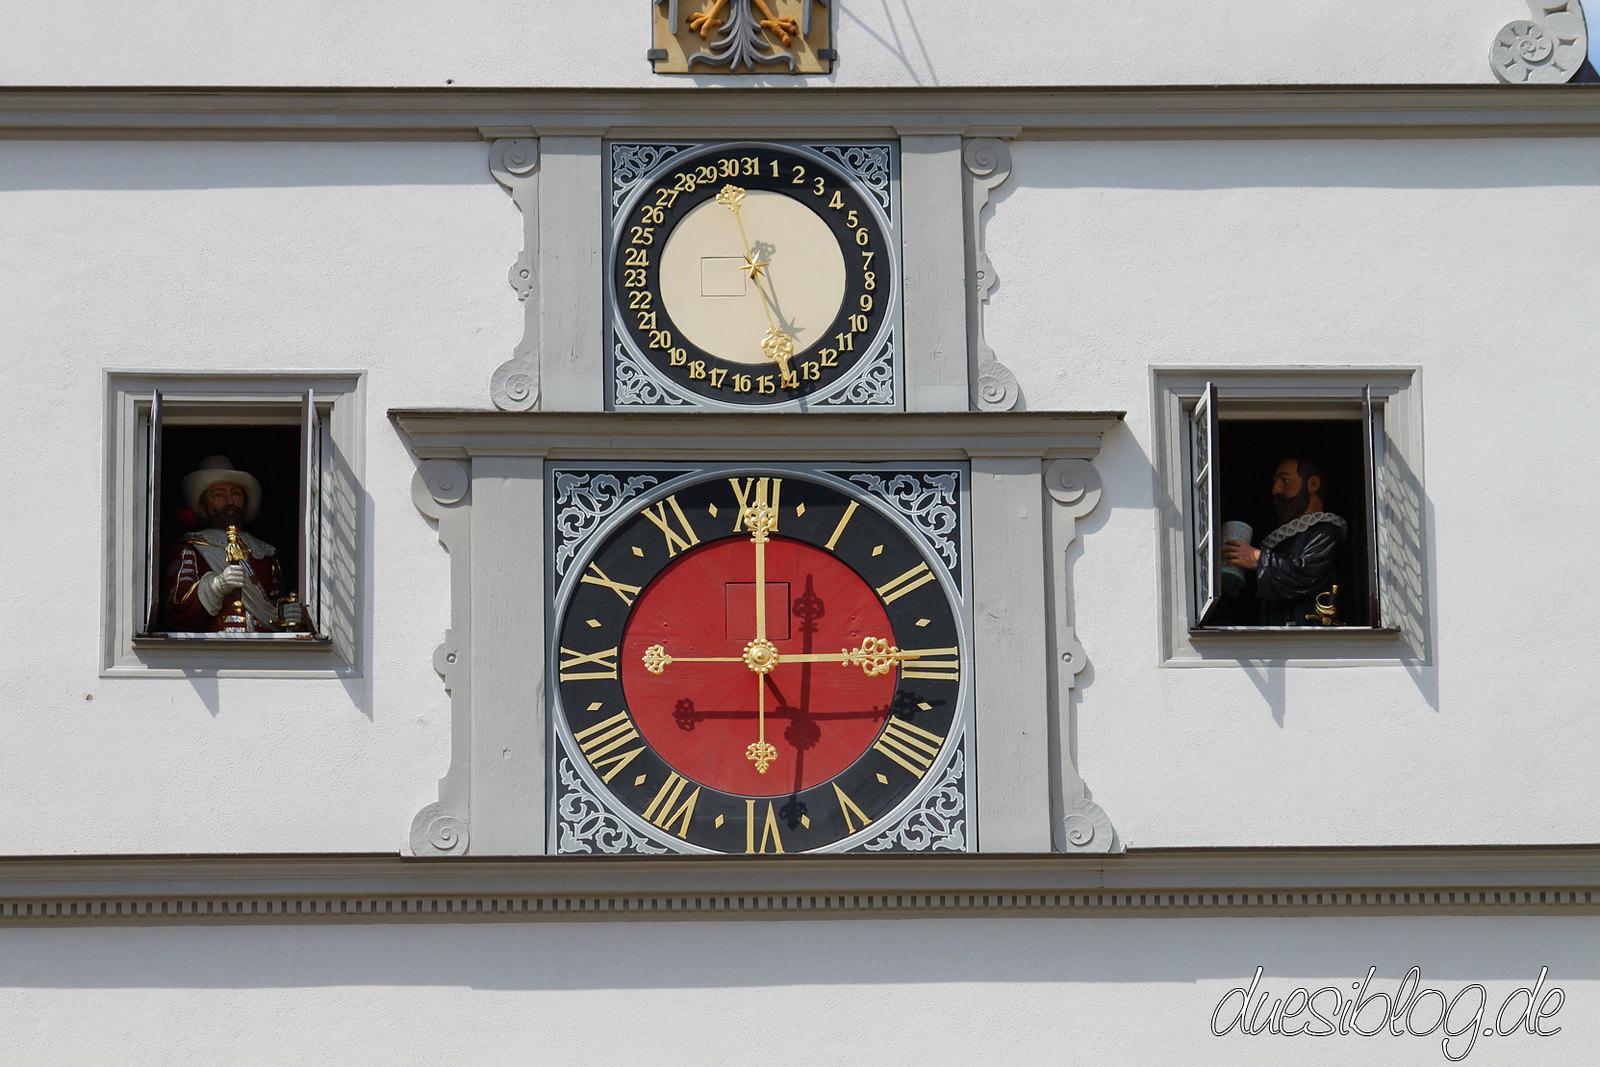 Rothenburg ob der Tauber Ratstrinkstube duesiblog 03